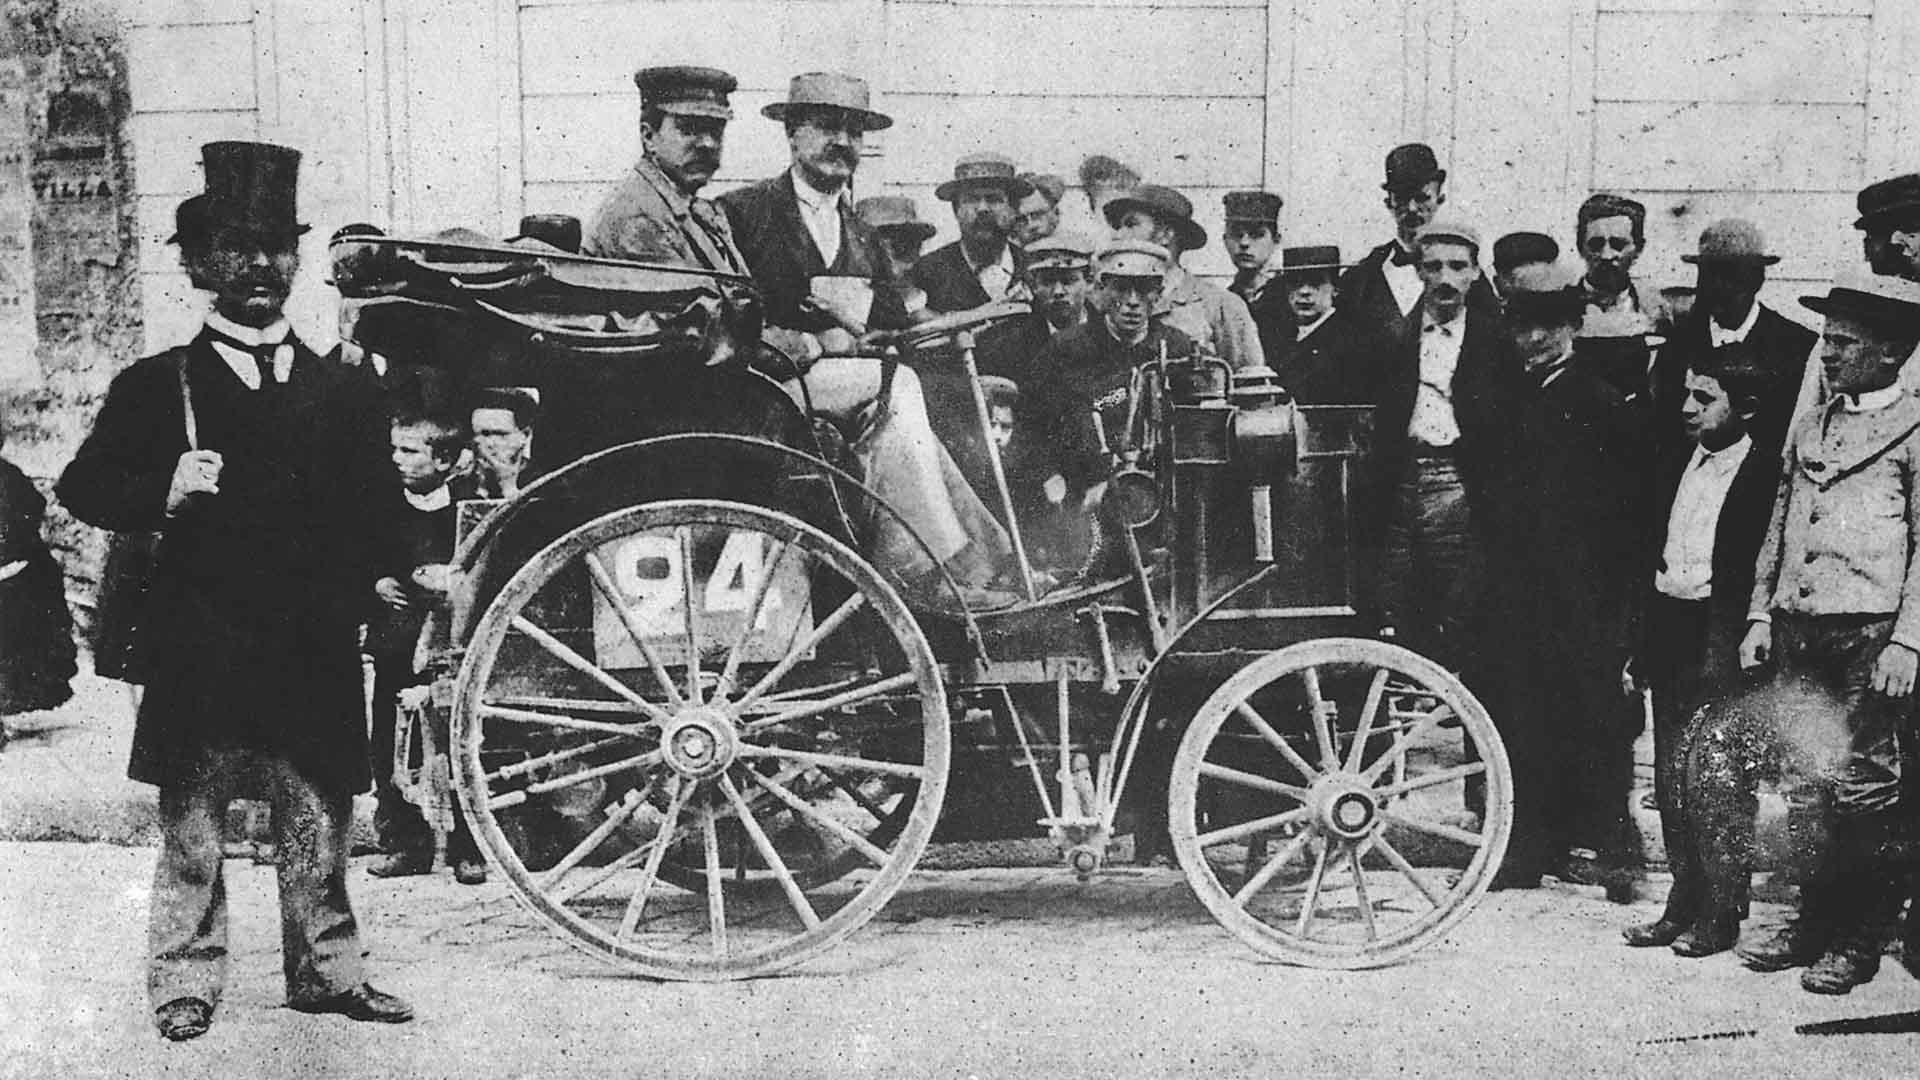 Alfred Vacheron invents the wheel